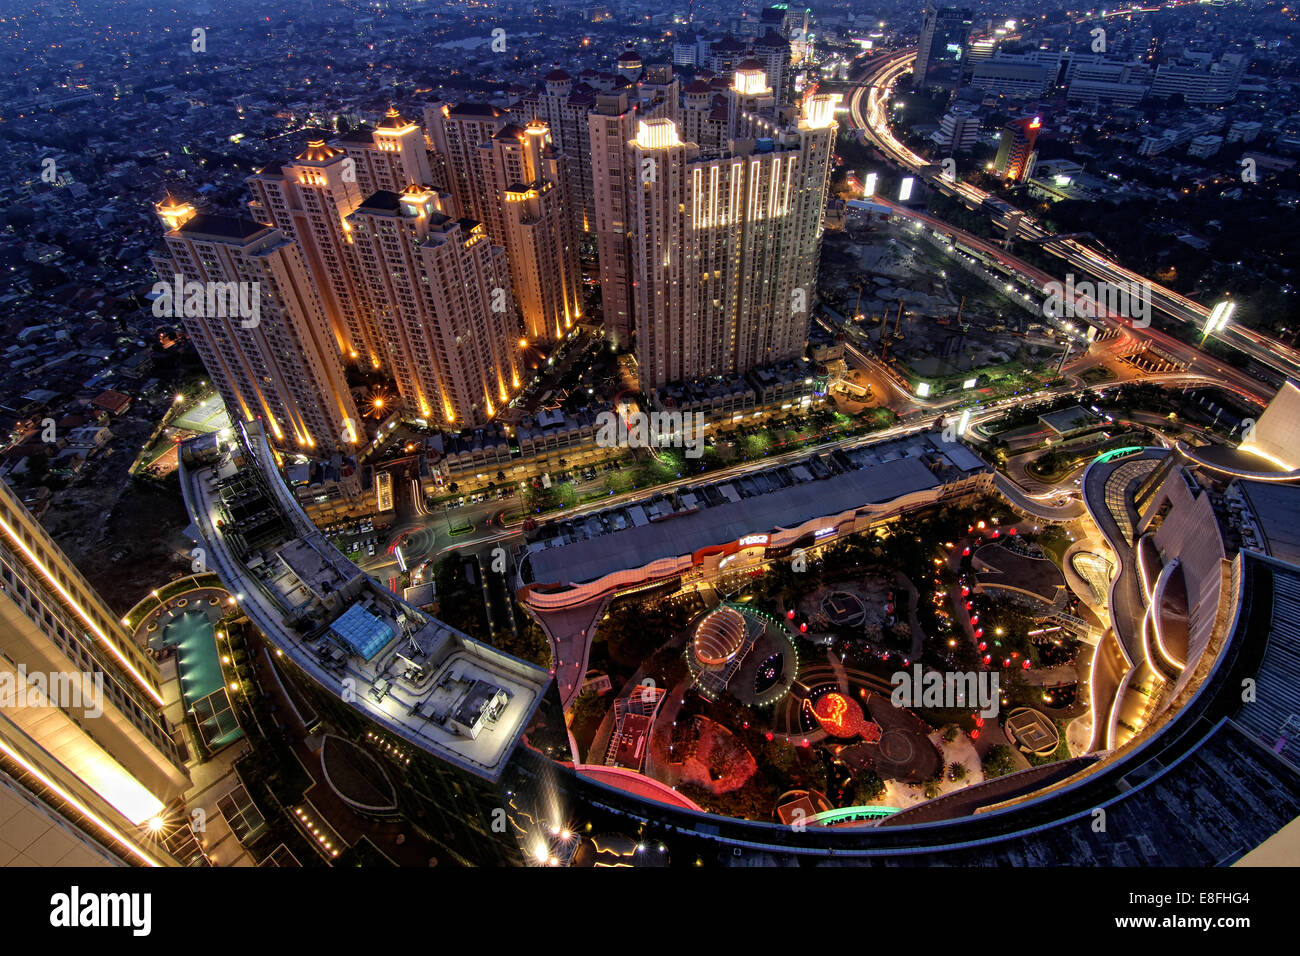 Indonesien, Jakarta spezielle Hauptstadtregion Daerah Khusus Ibukota Jakarta, Letjen S Parman Nacht Stadtbild von Stockbild